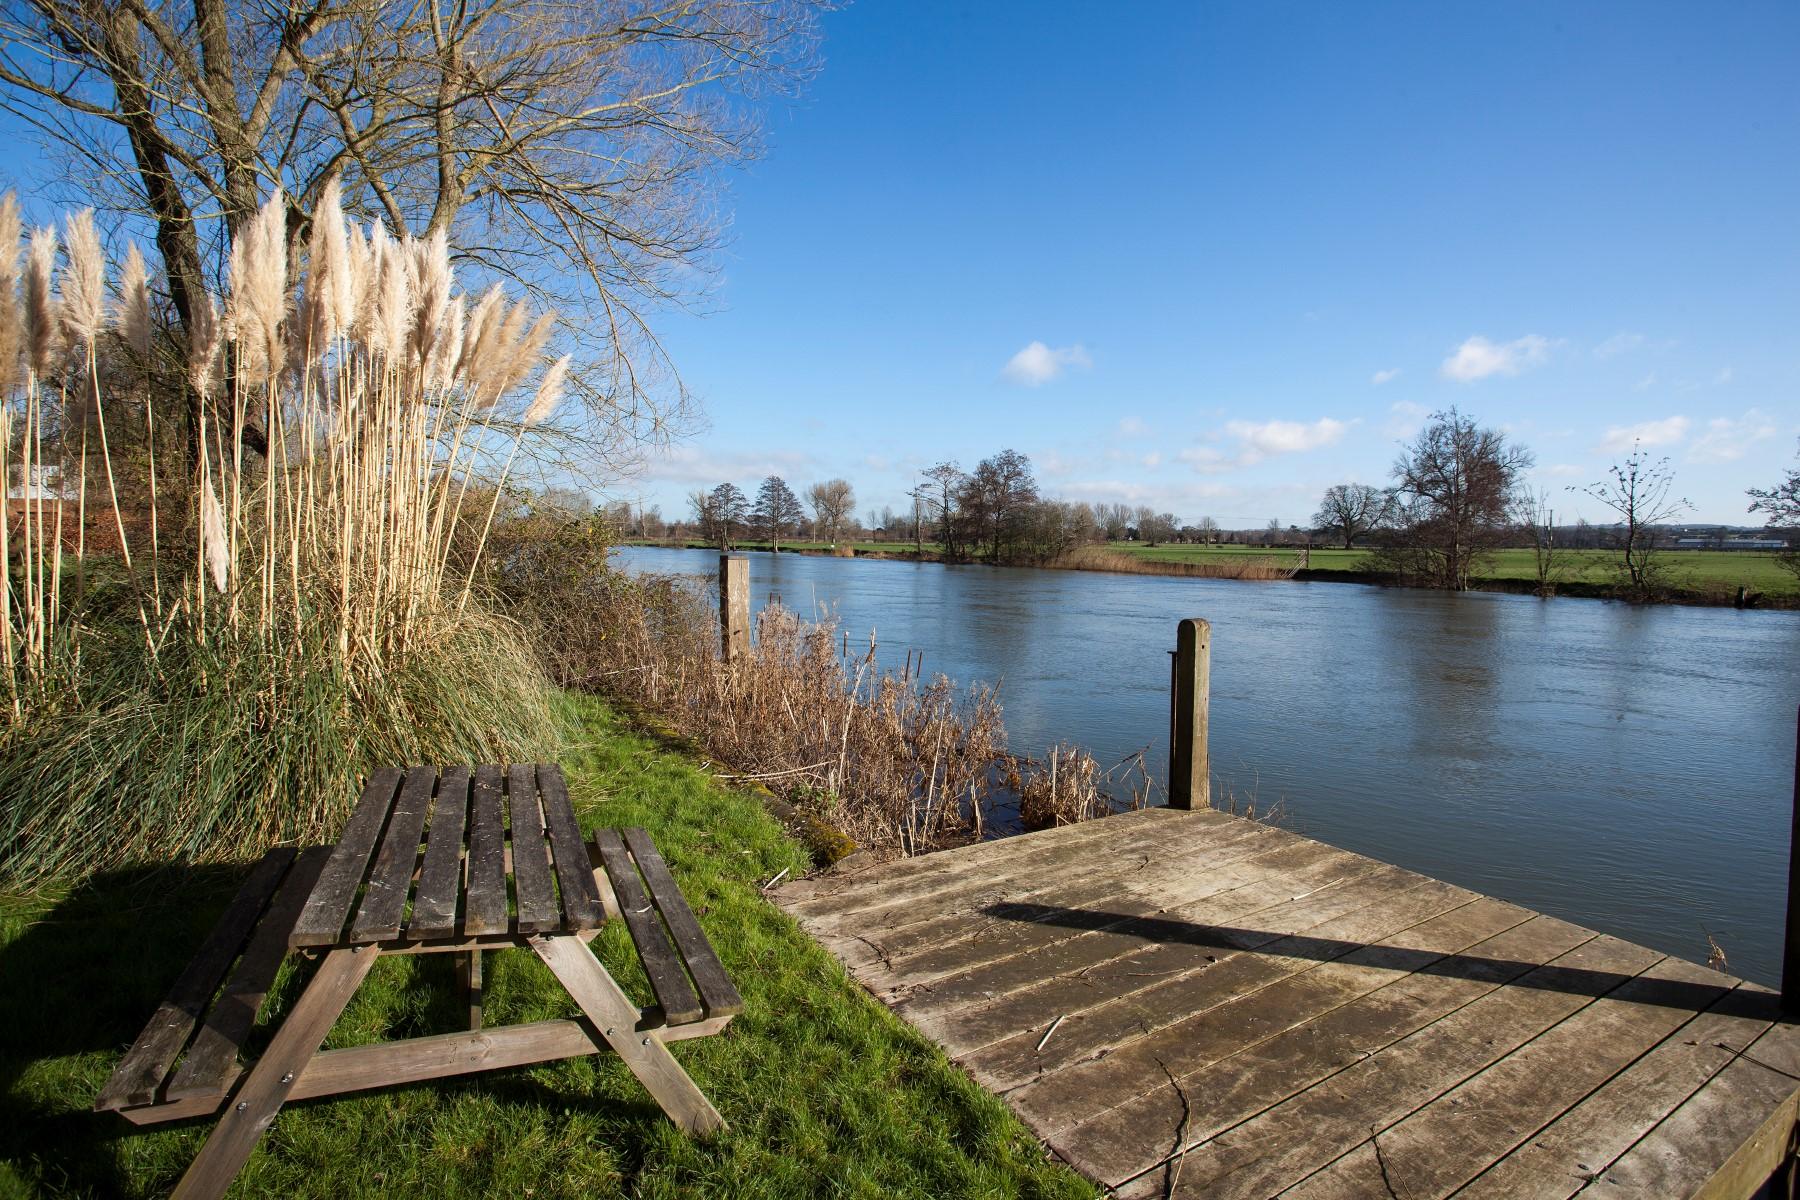 Maison unifamiliale pour l Vente à Waterfront Property, Oxford Chalmore Gardens Wallingford, Angleterre, OX109EP Royaume-Uni